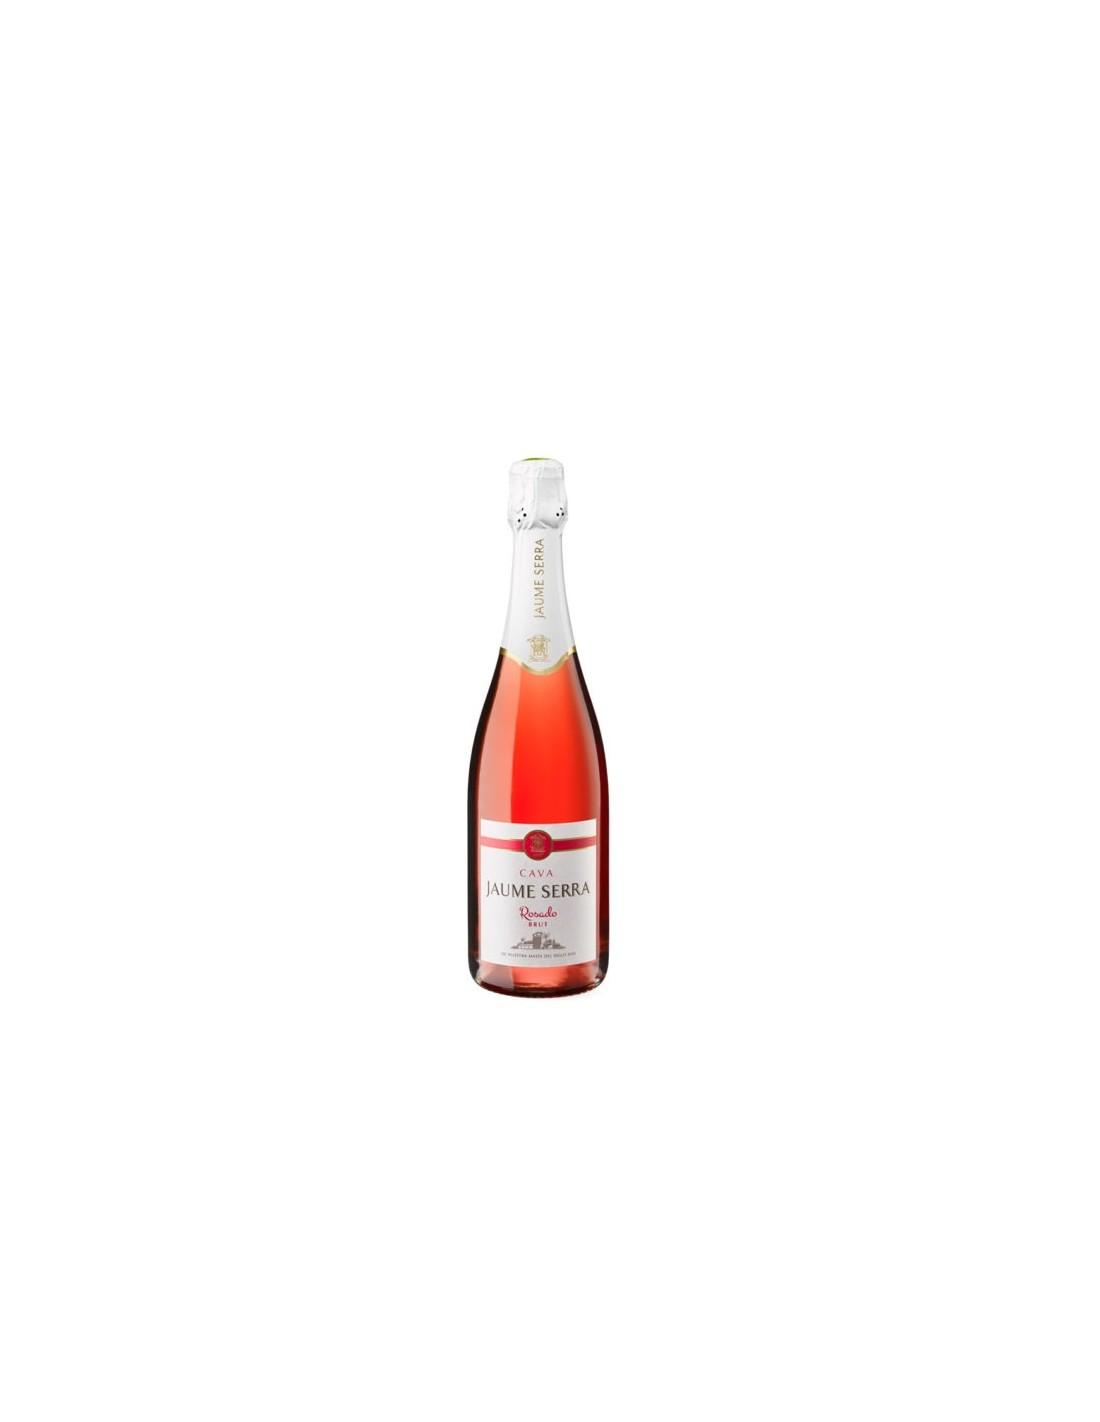 Vin roze Jaume Serra Brut Rosado, 11.5% alc., 0.75L, Spania